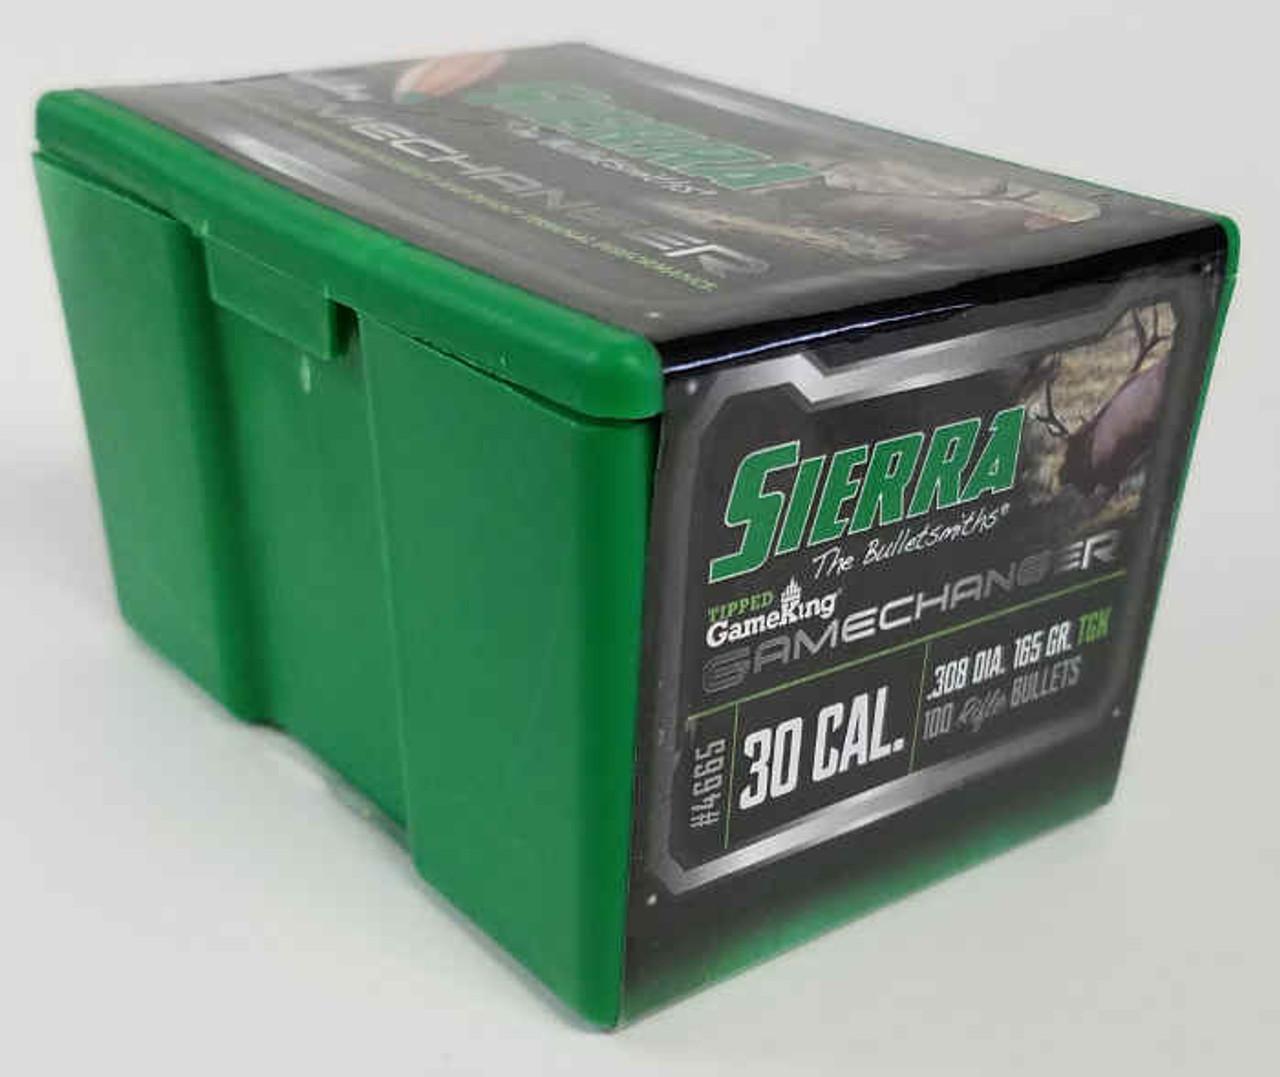 Sierra GameChanger - Tipped GameKing Bullets 30 Caliber  308 Diameter 165  Grain, Spitzer, 12 pack